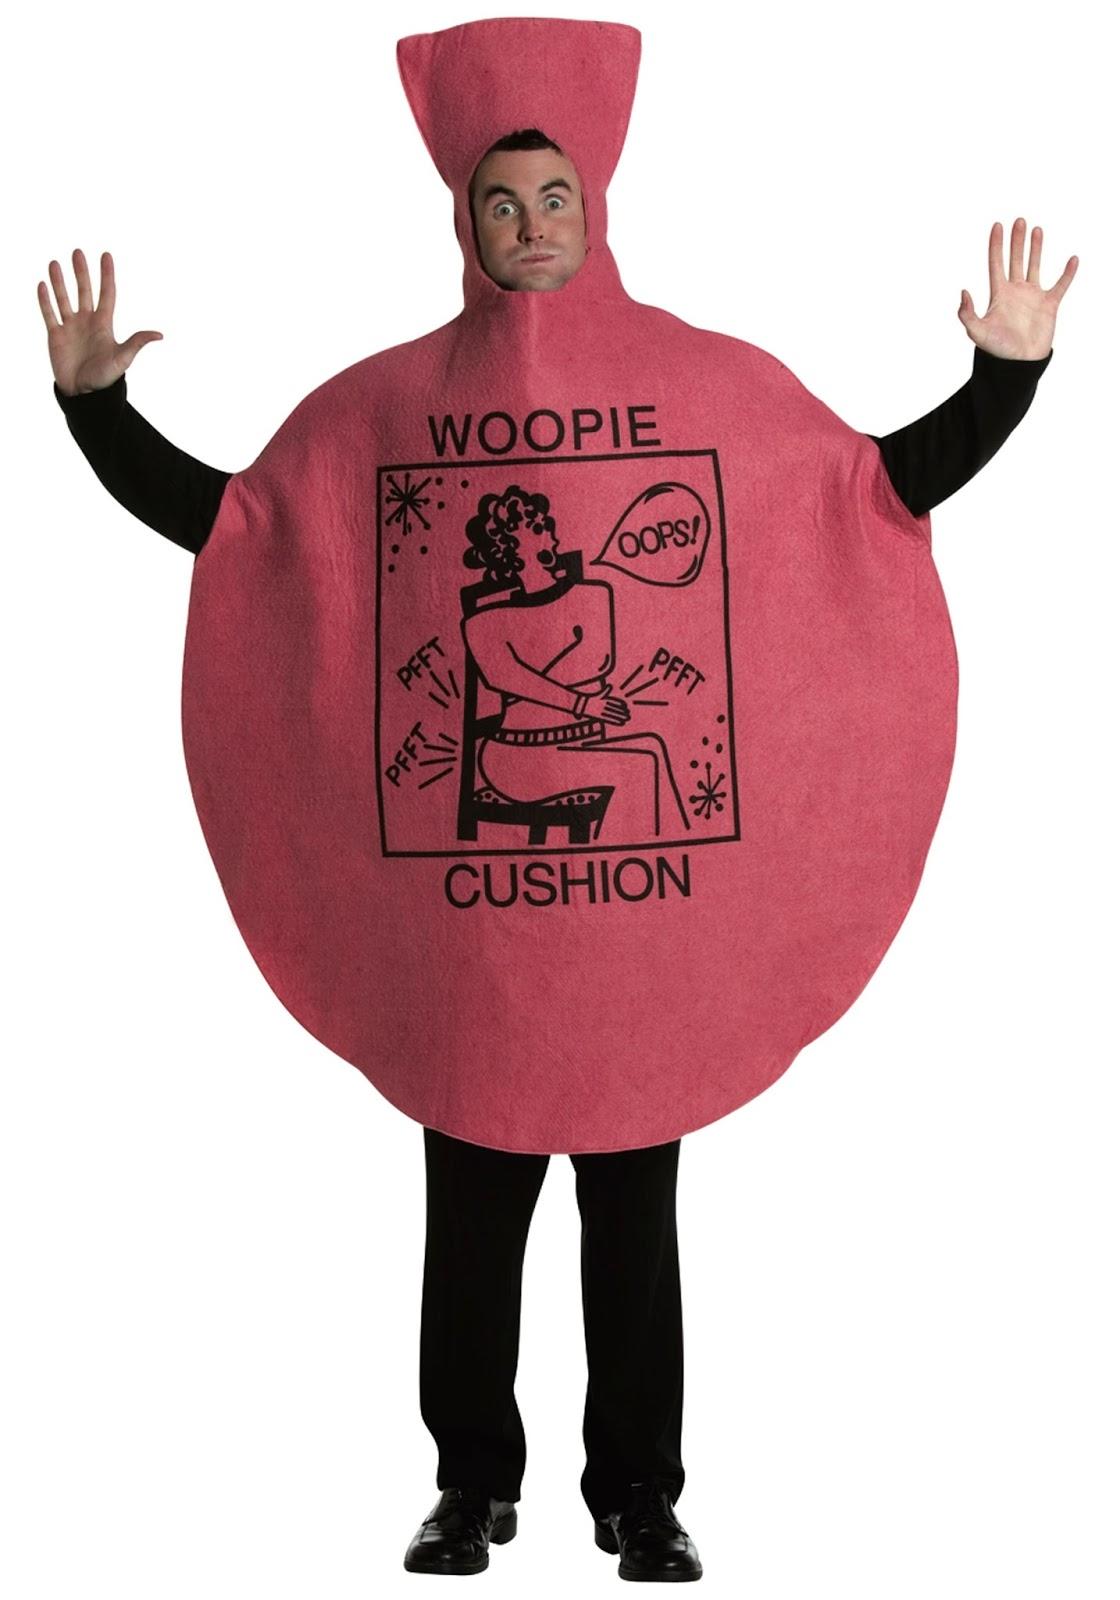 whoopie-cushion-costume.jpg